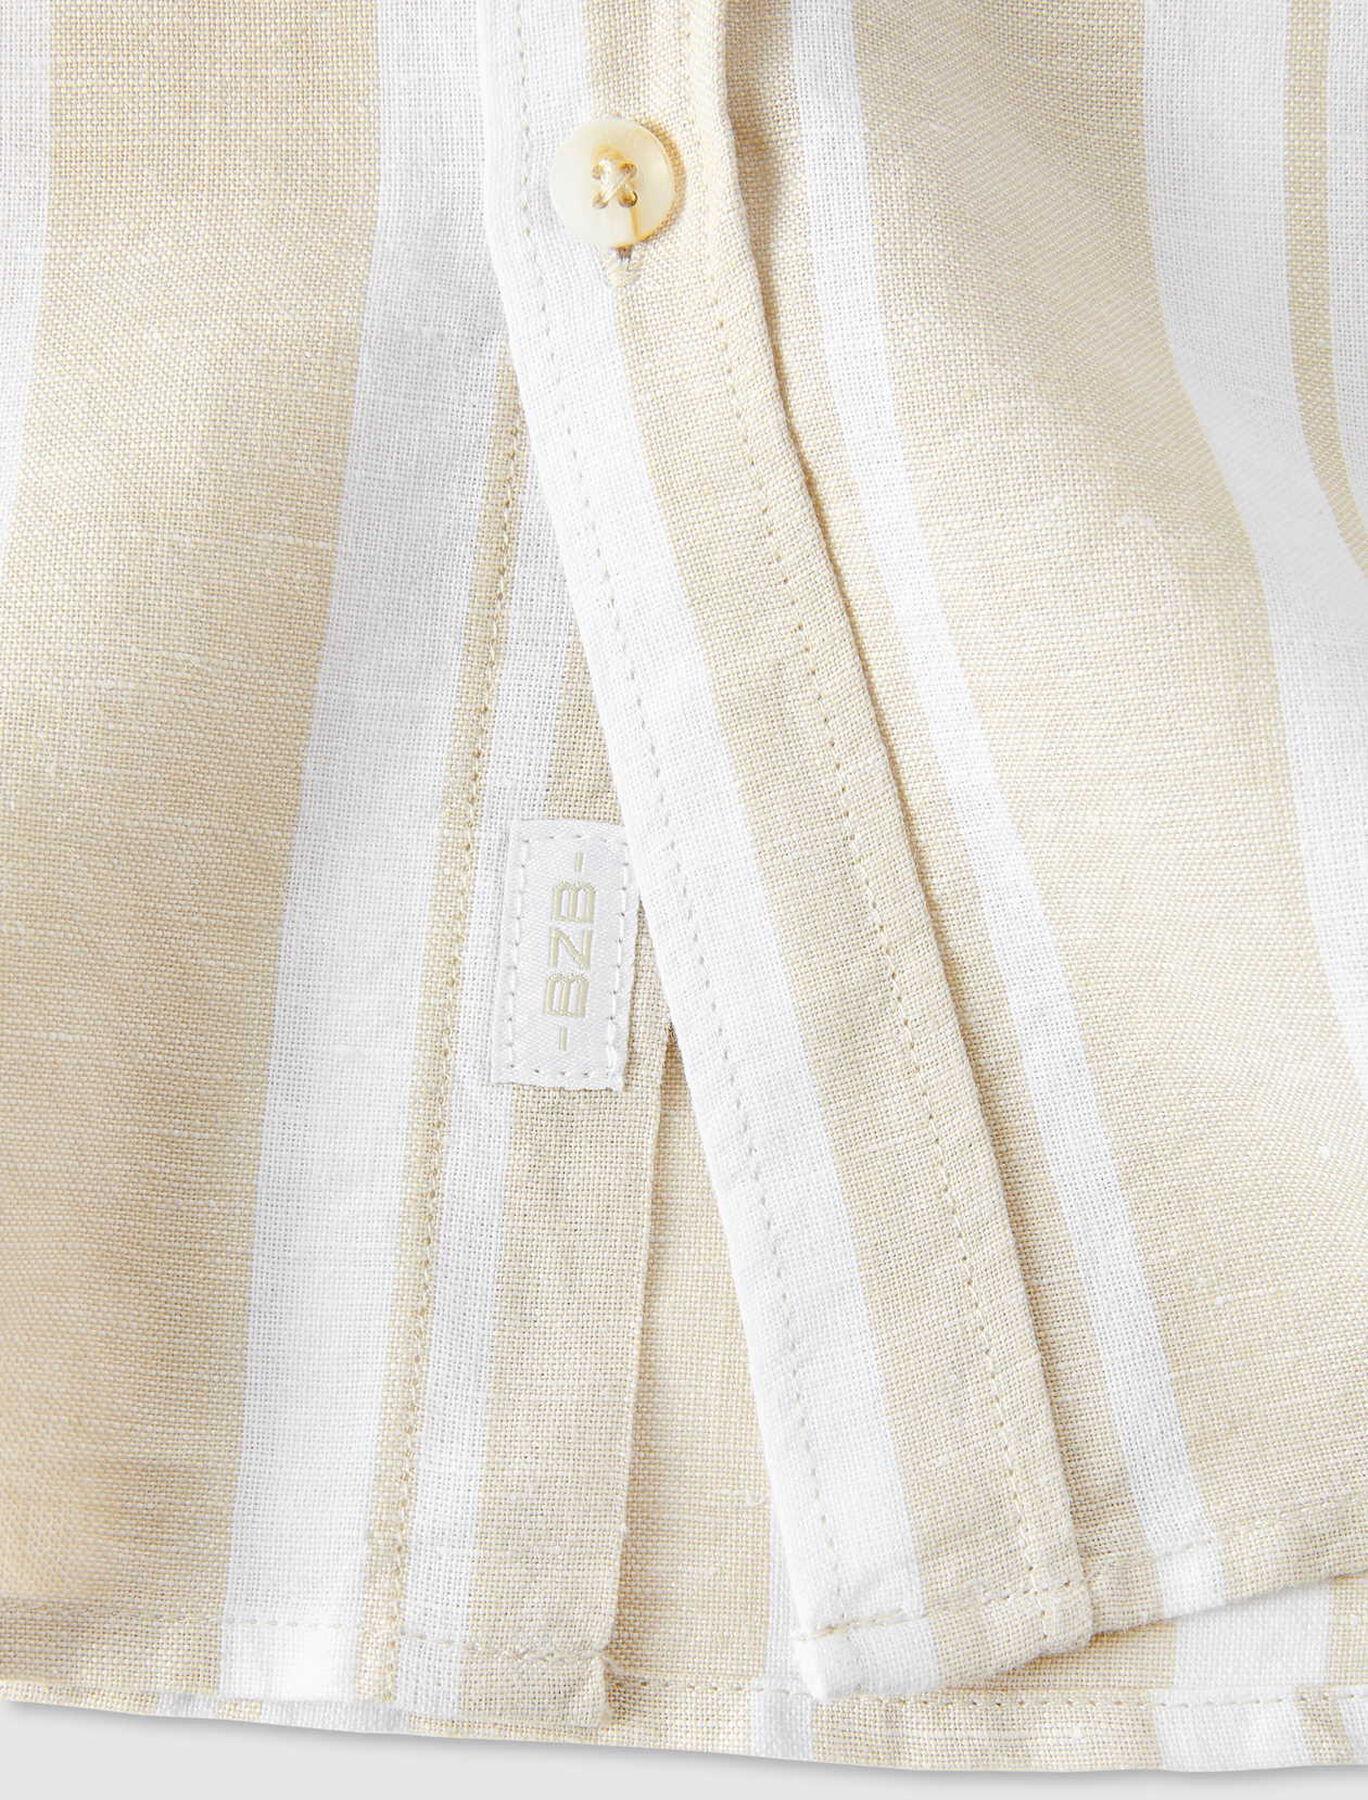 Chemise rayée en coton/lin